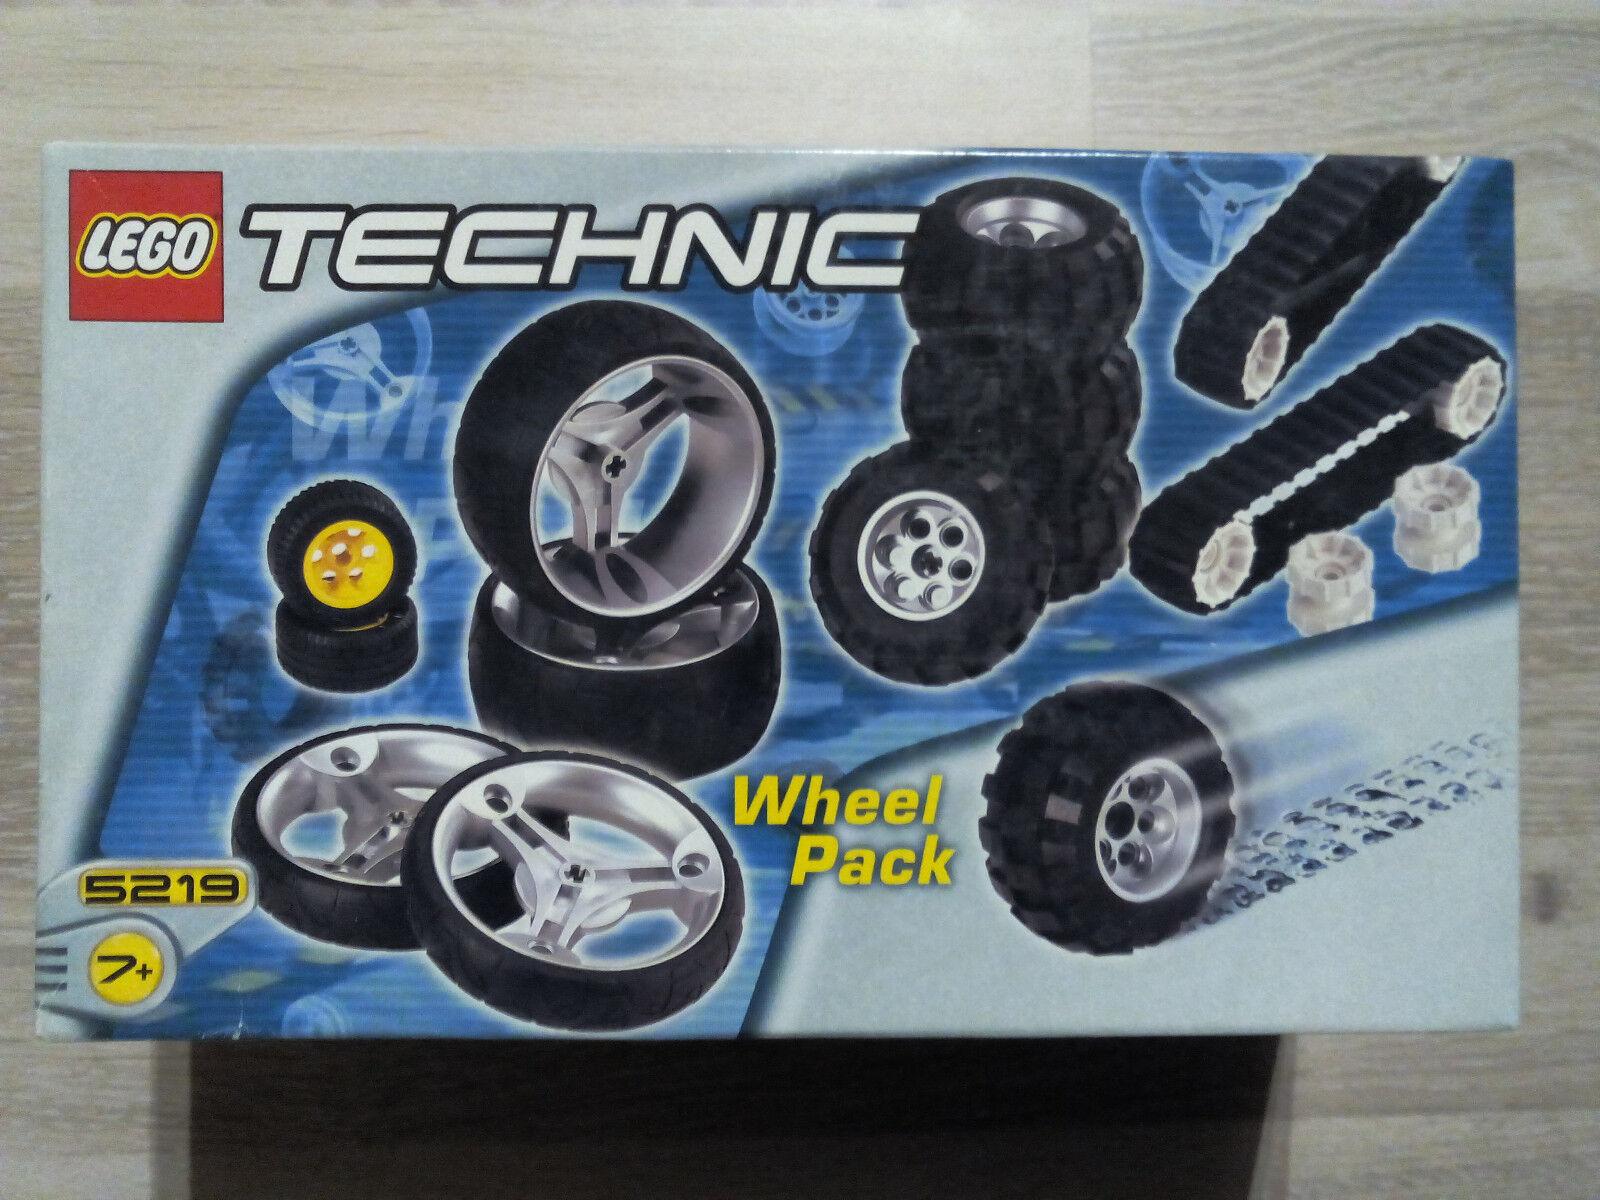 Lego Technic Technik 5219 Silber Wheel Multi Pack   NEU & OVP - UNGEÖFFNET